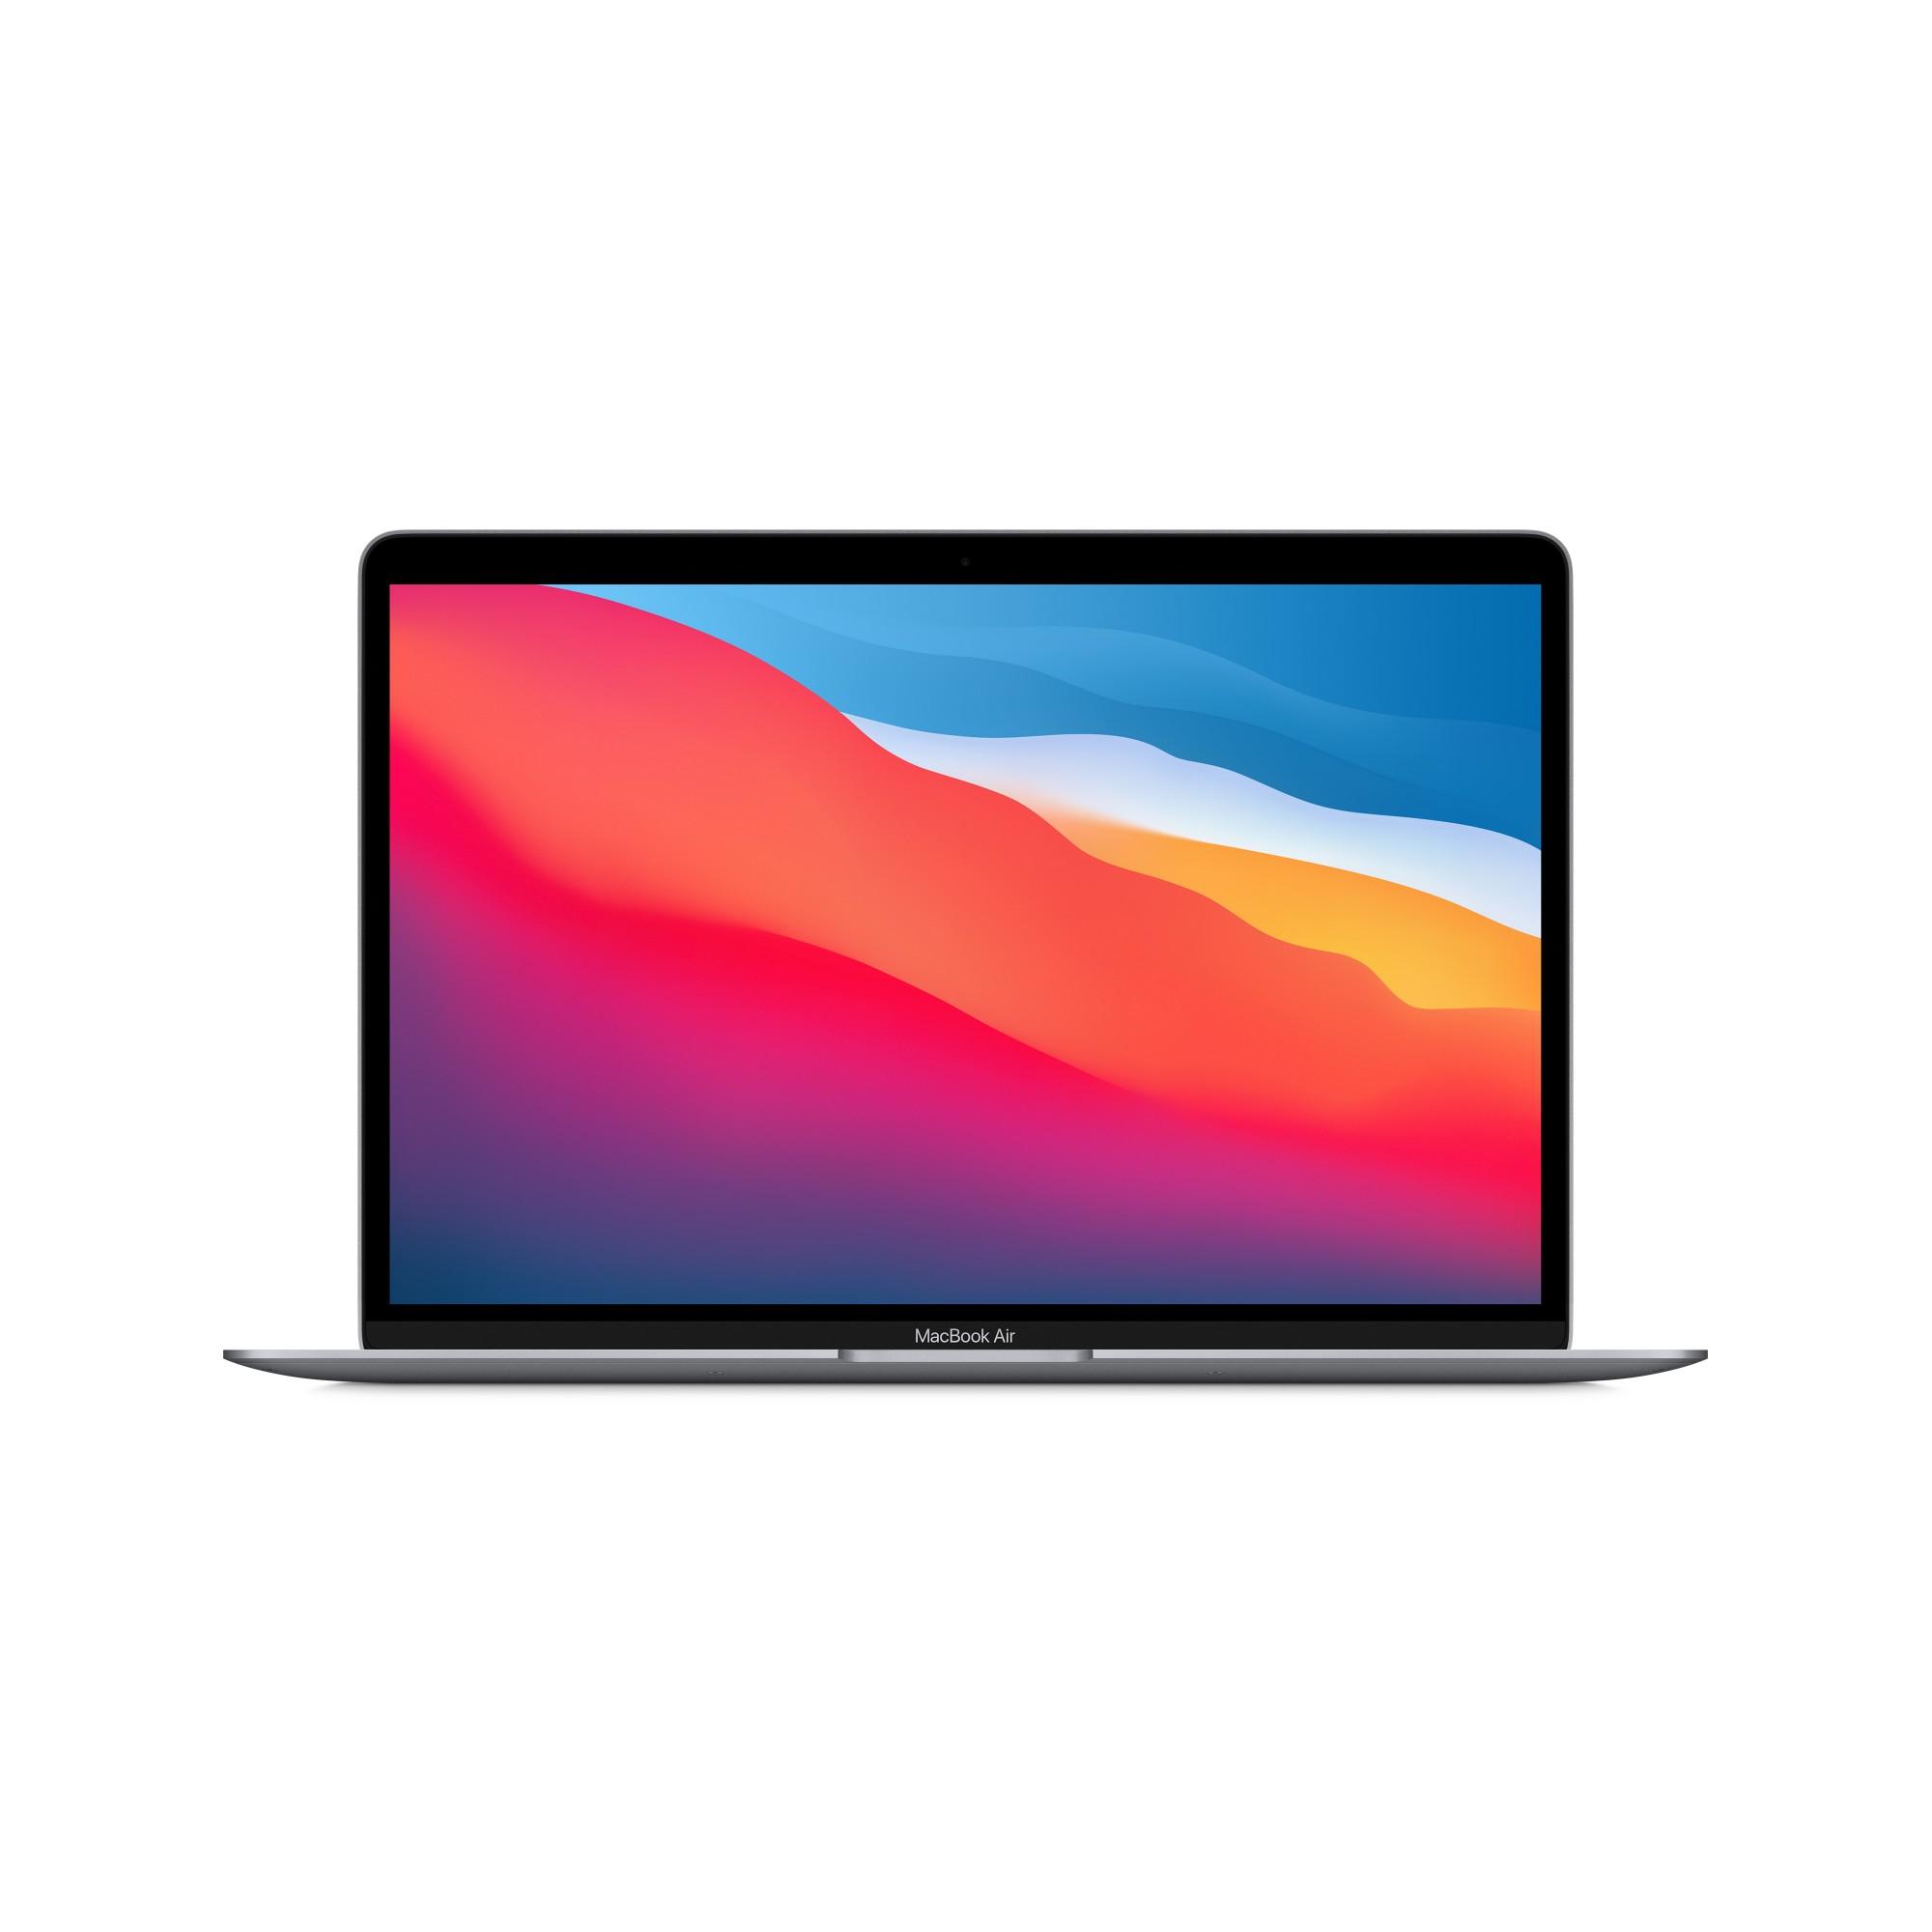 Apple MacBook Air 13-inch : M1 chip with 8-core CPU and 8-core GPU, 512GB - Space Grey (2020)